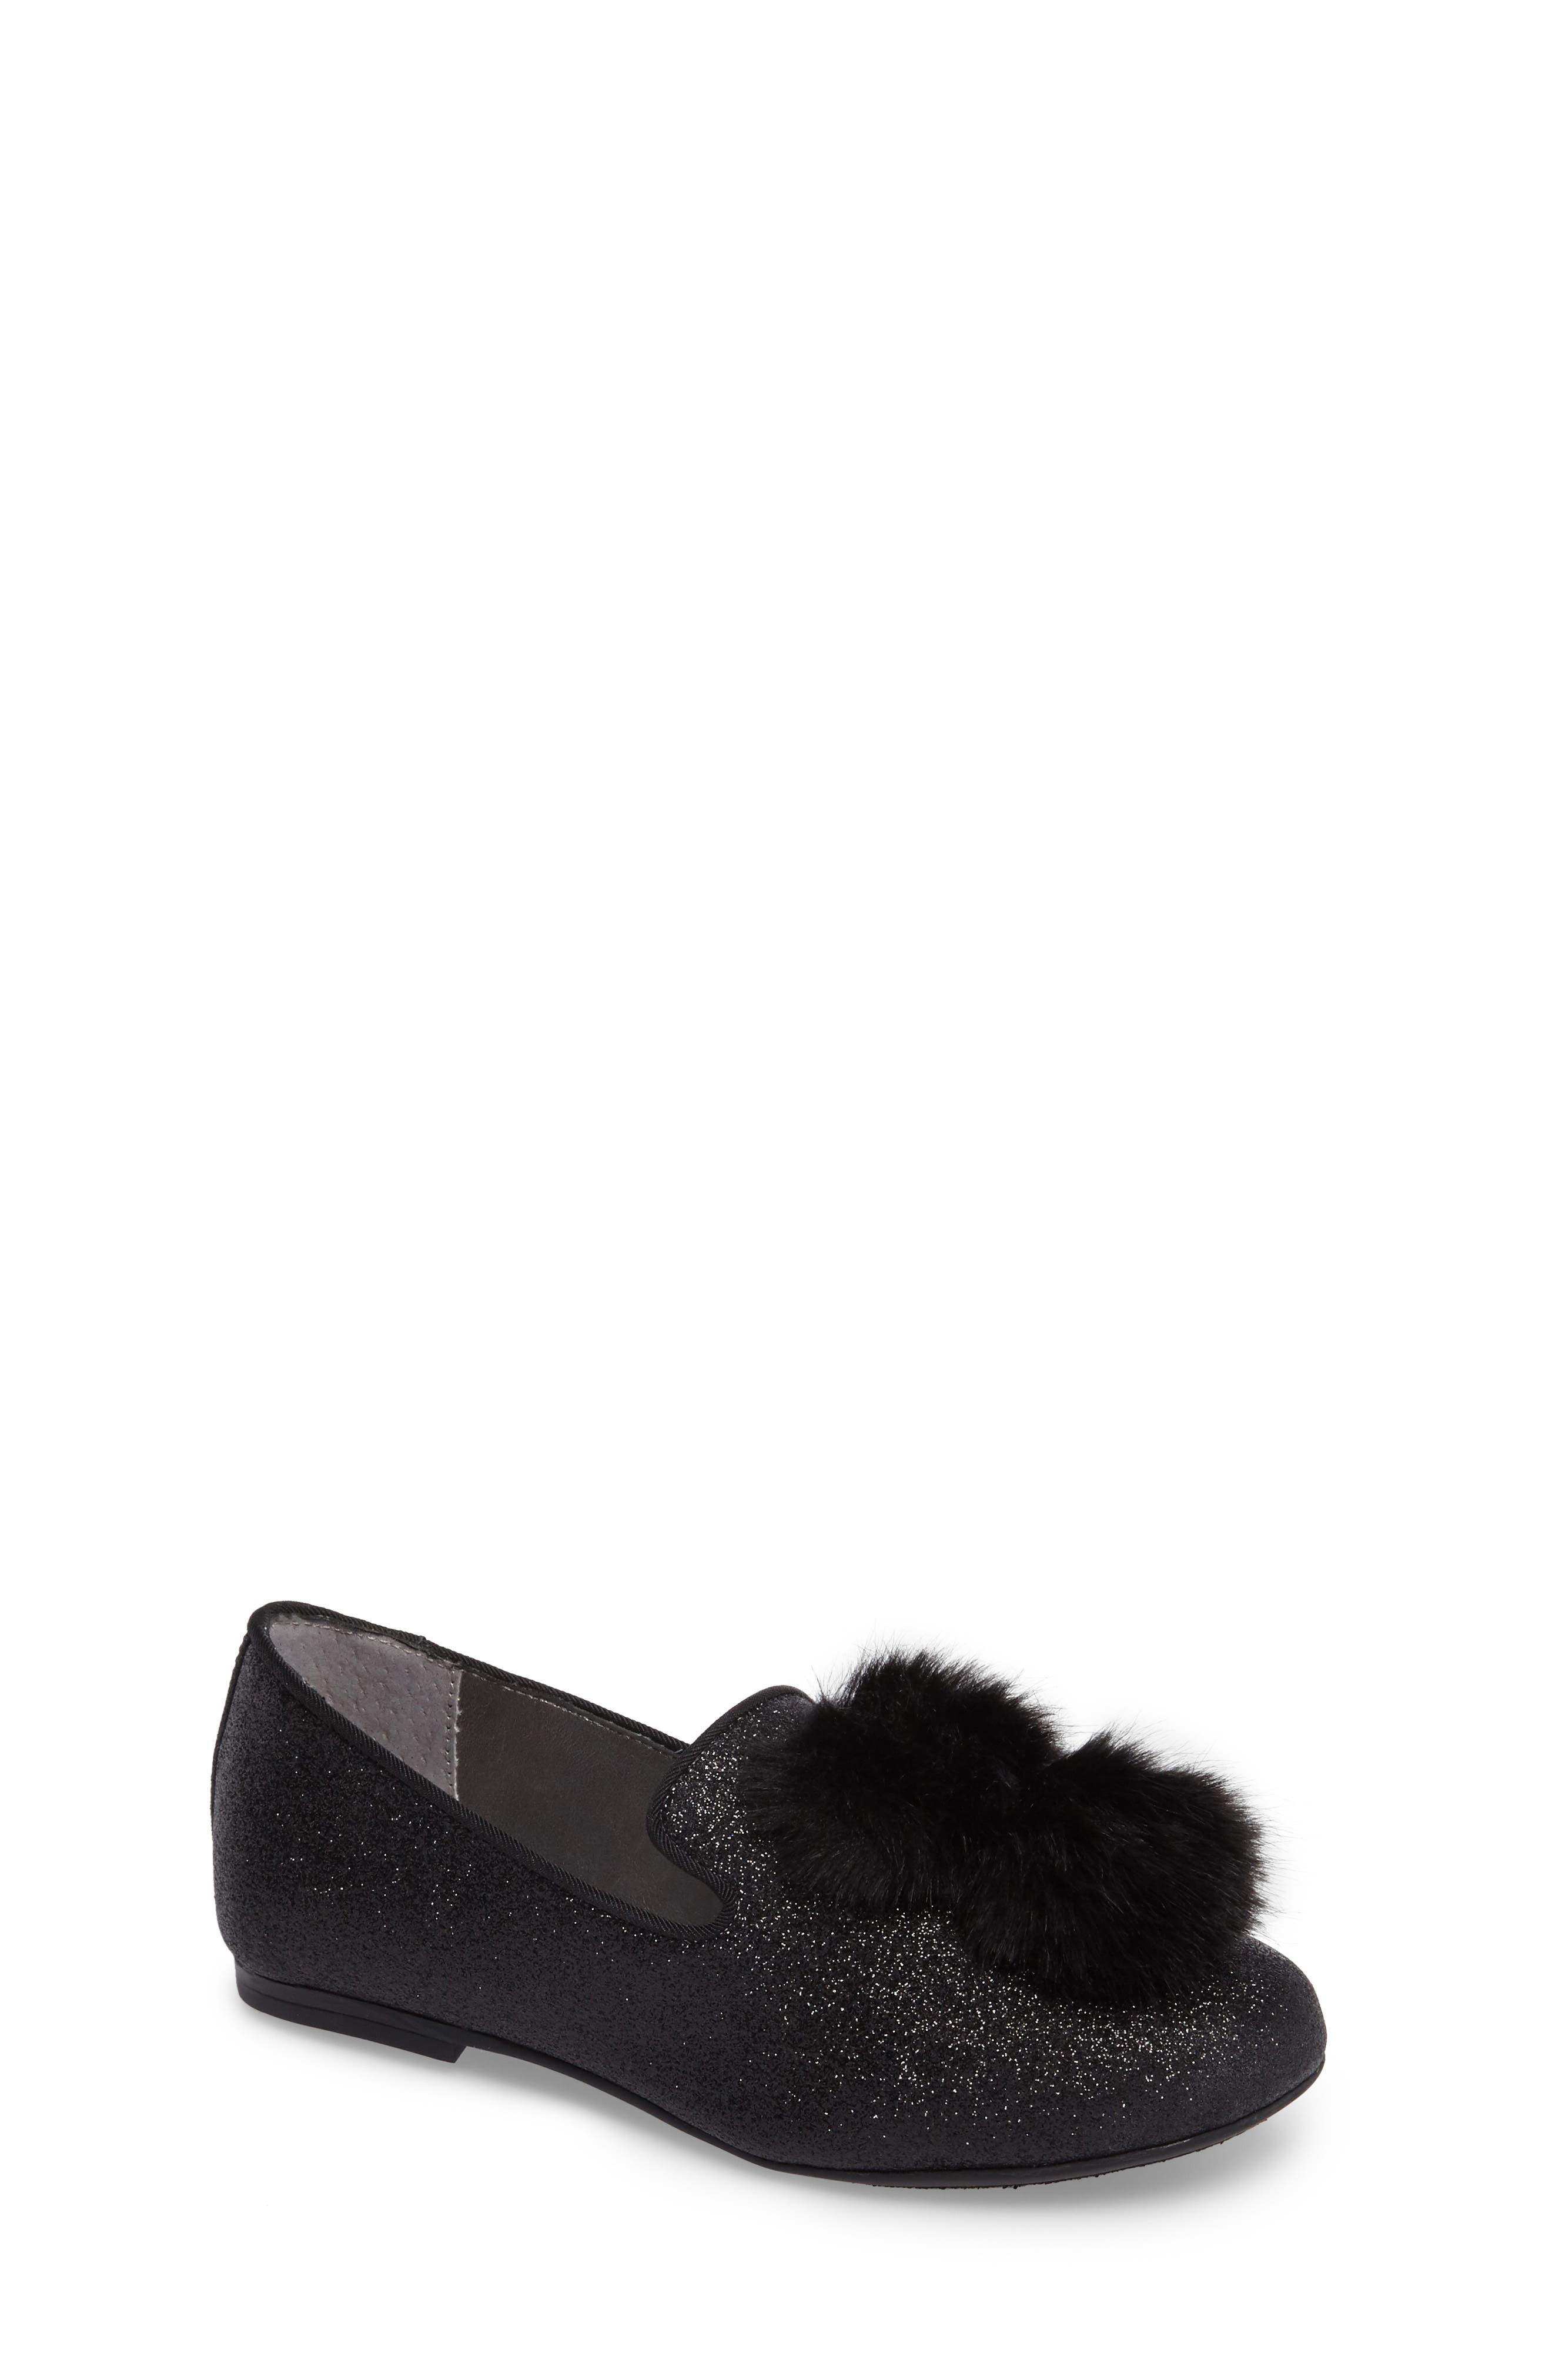 Caela Faux Fur Loafer,                             Main thumbnail 1, color,                             001